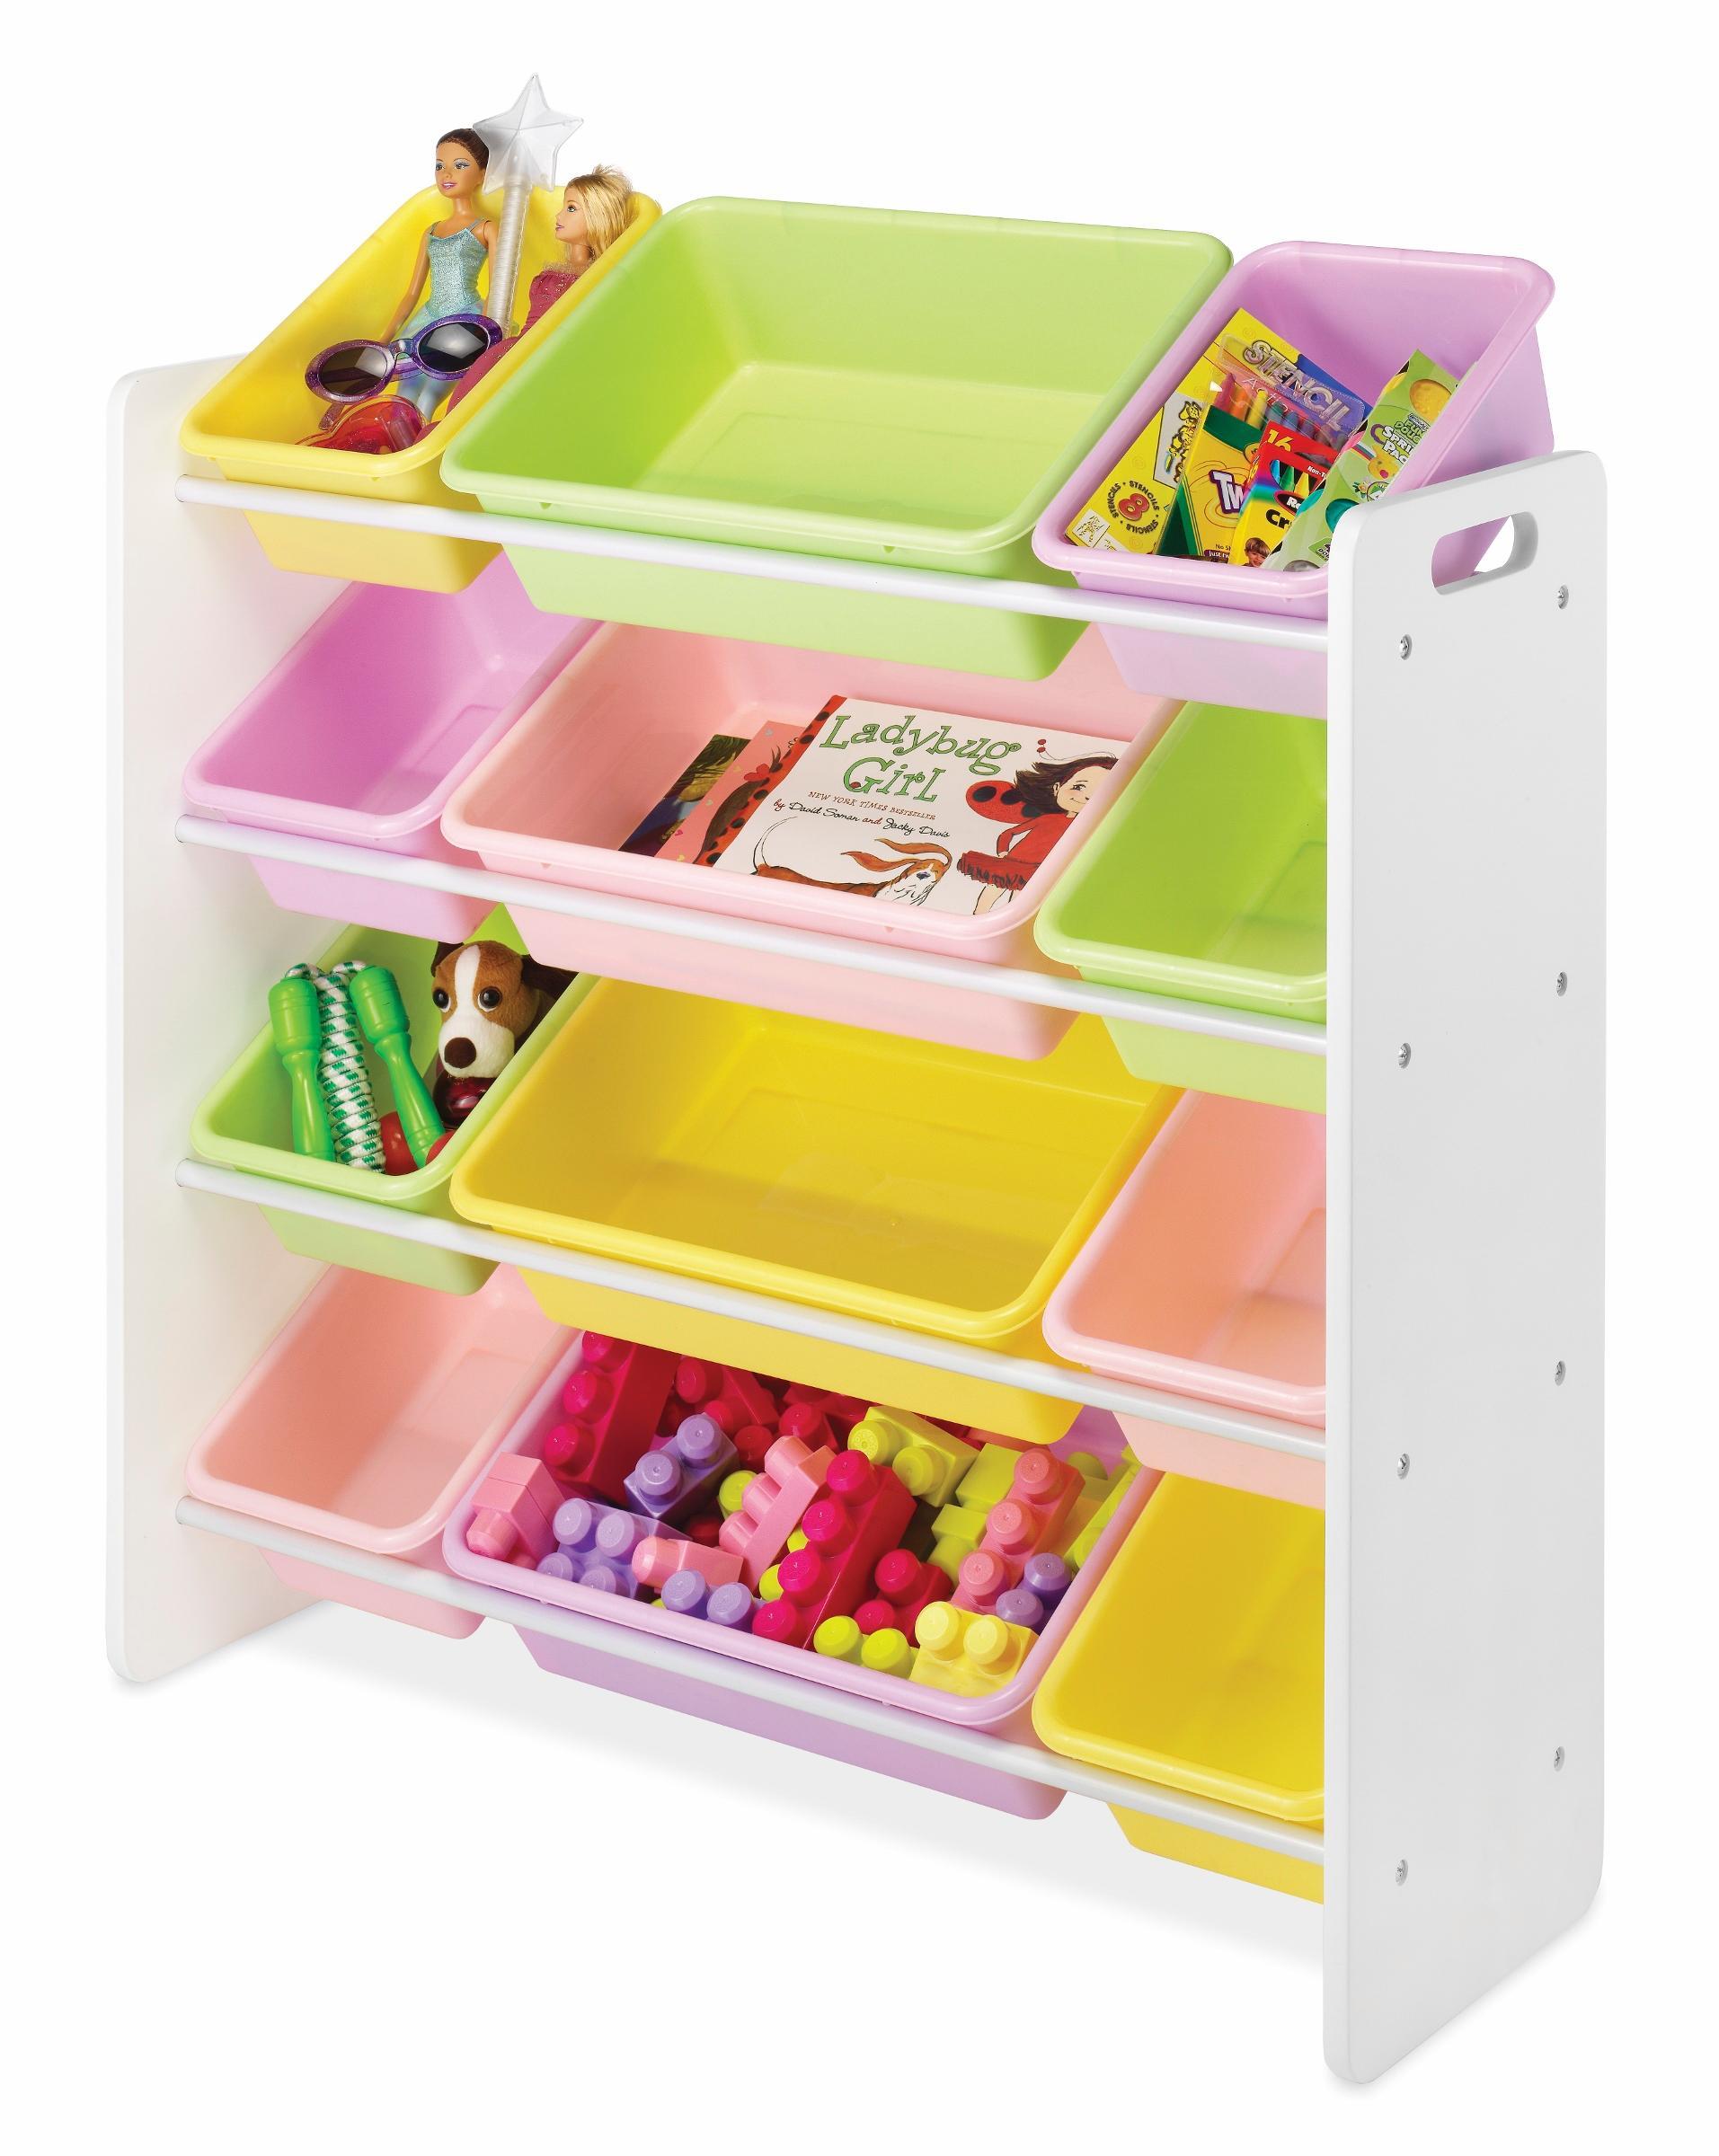 Whitmor 6437-2554-DS 12 Bin Organizer, Pastel